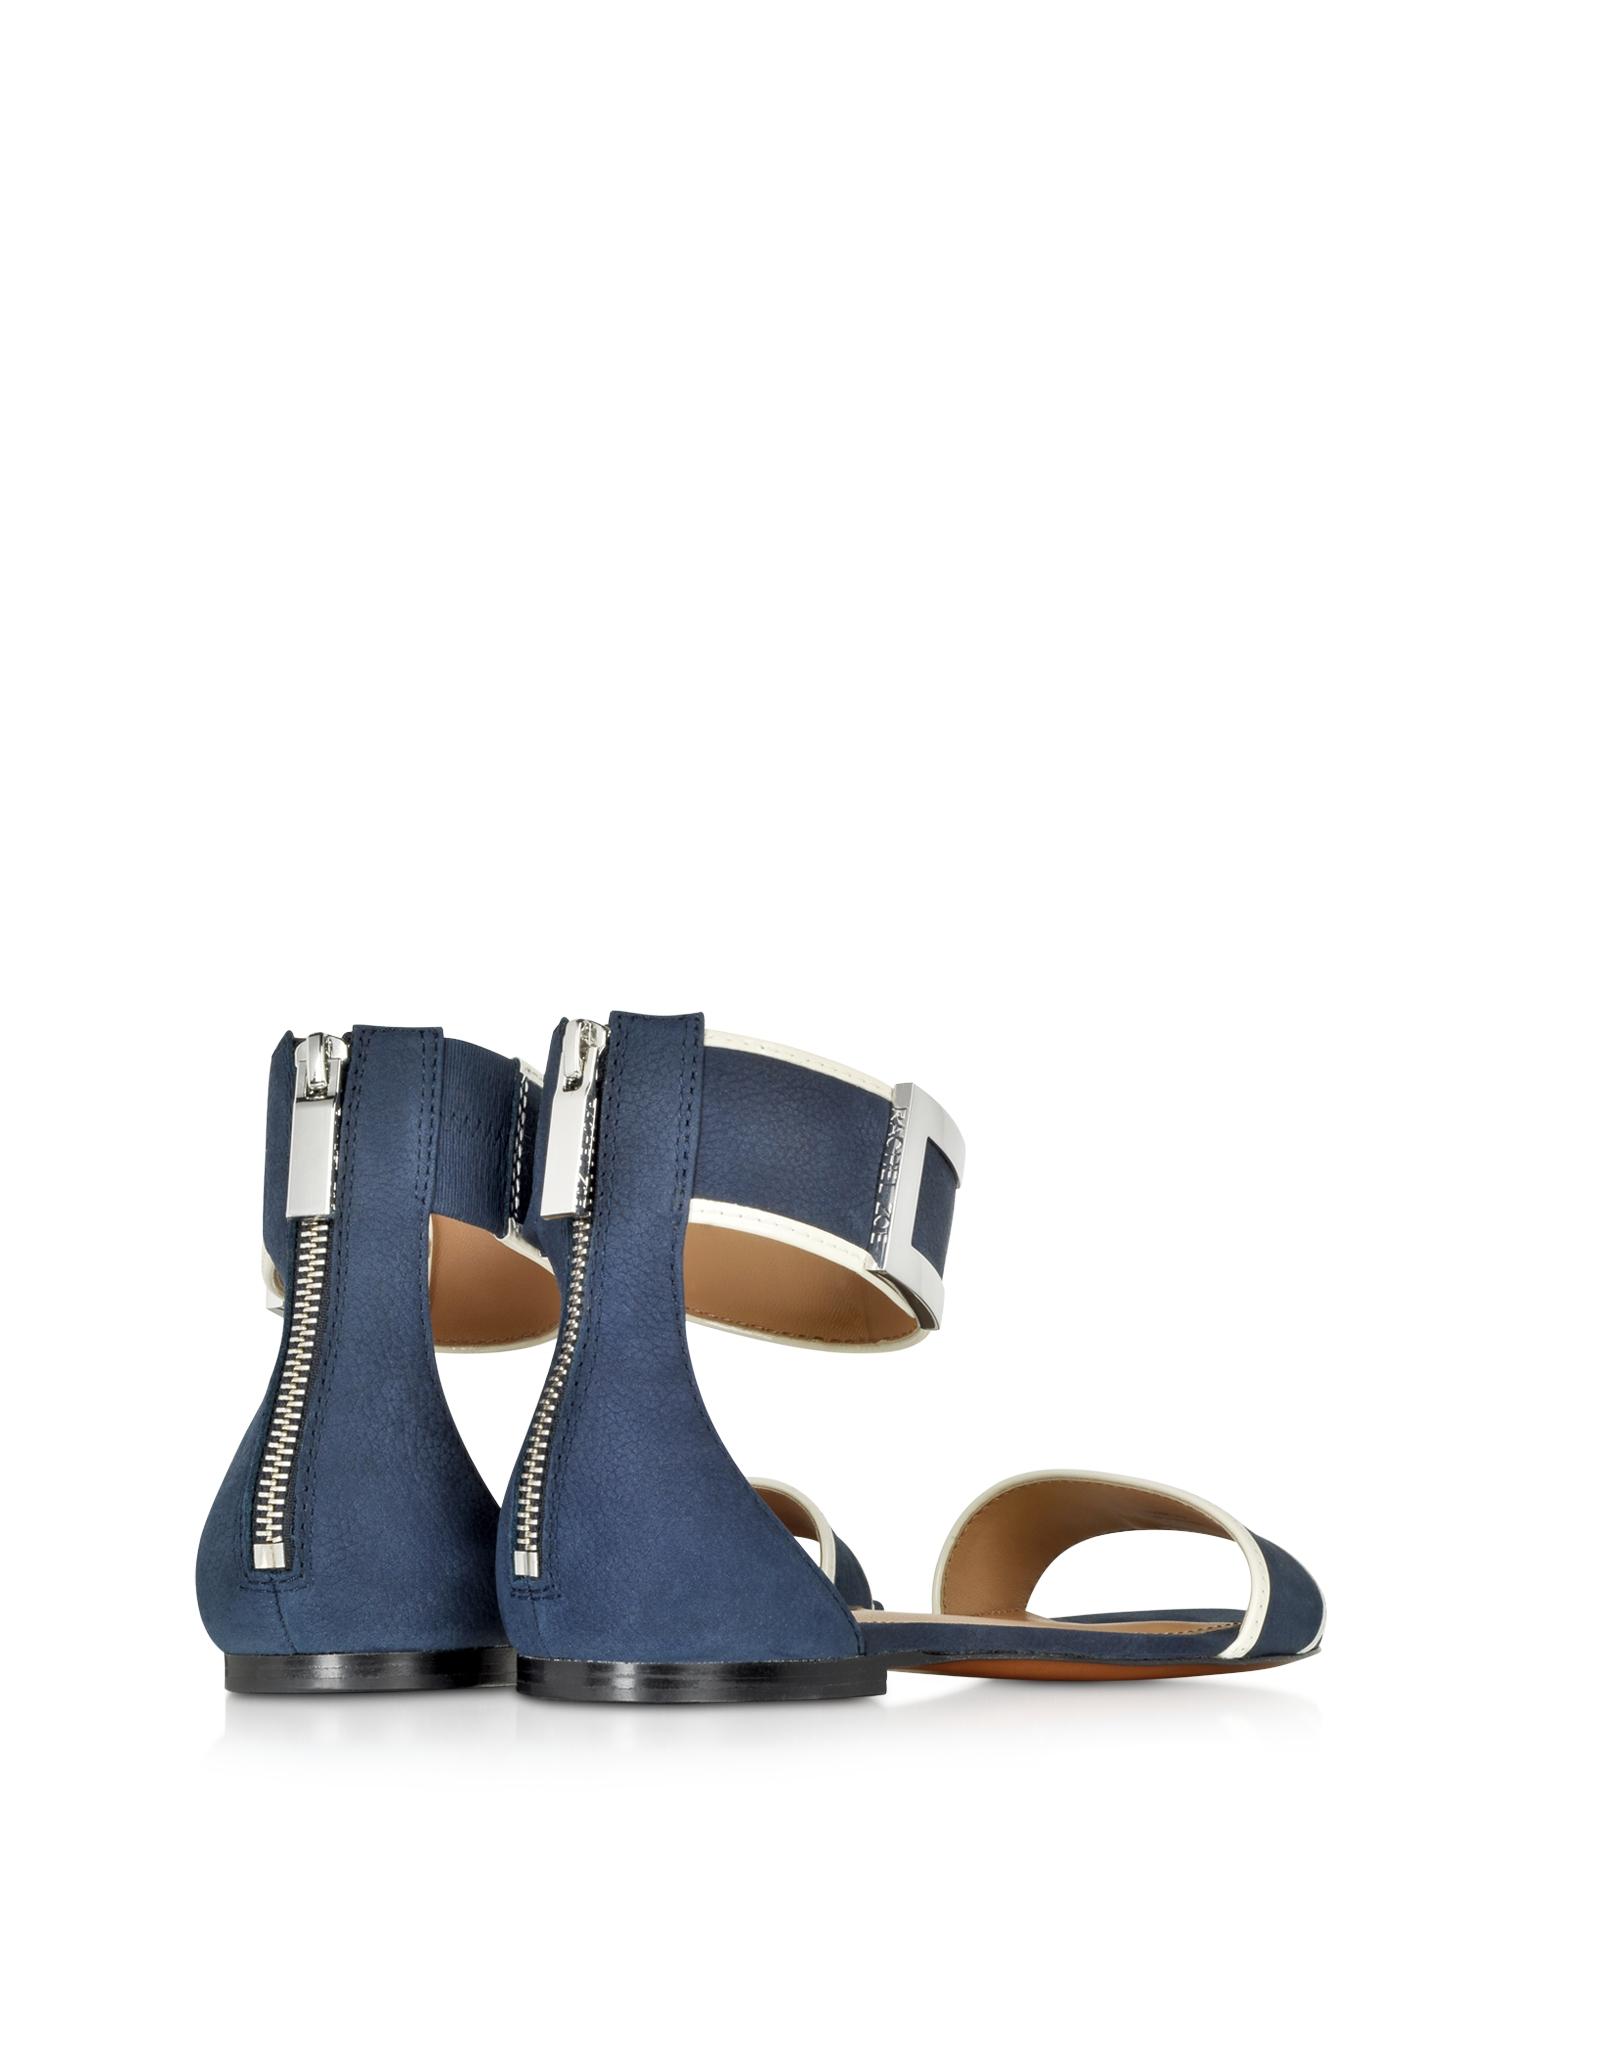 61e1152a16bb Lyst - Rachel Zoe Gracie Navy Blue and White Flat Sandal in Blue